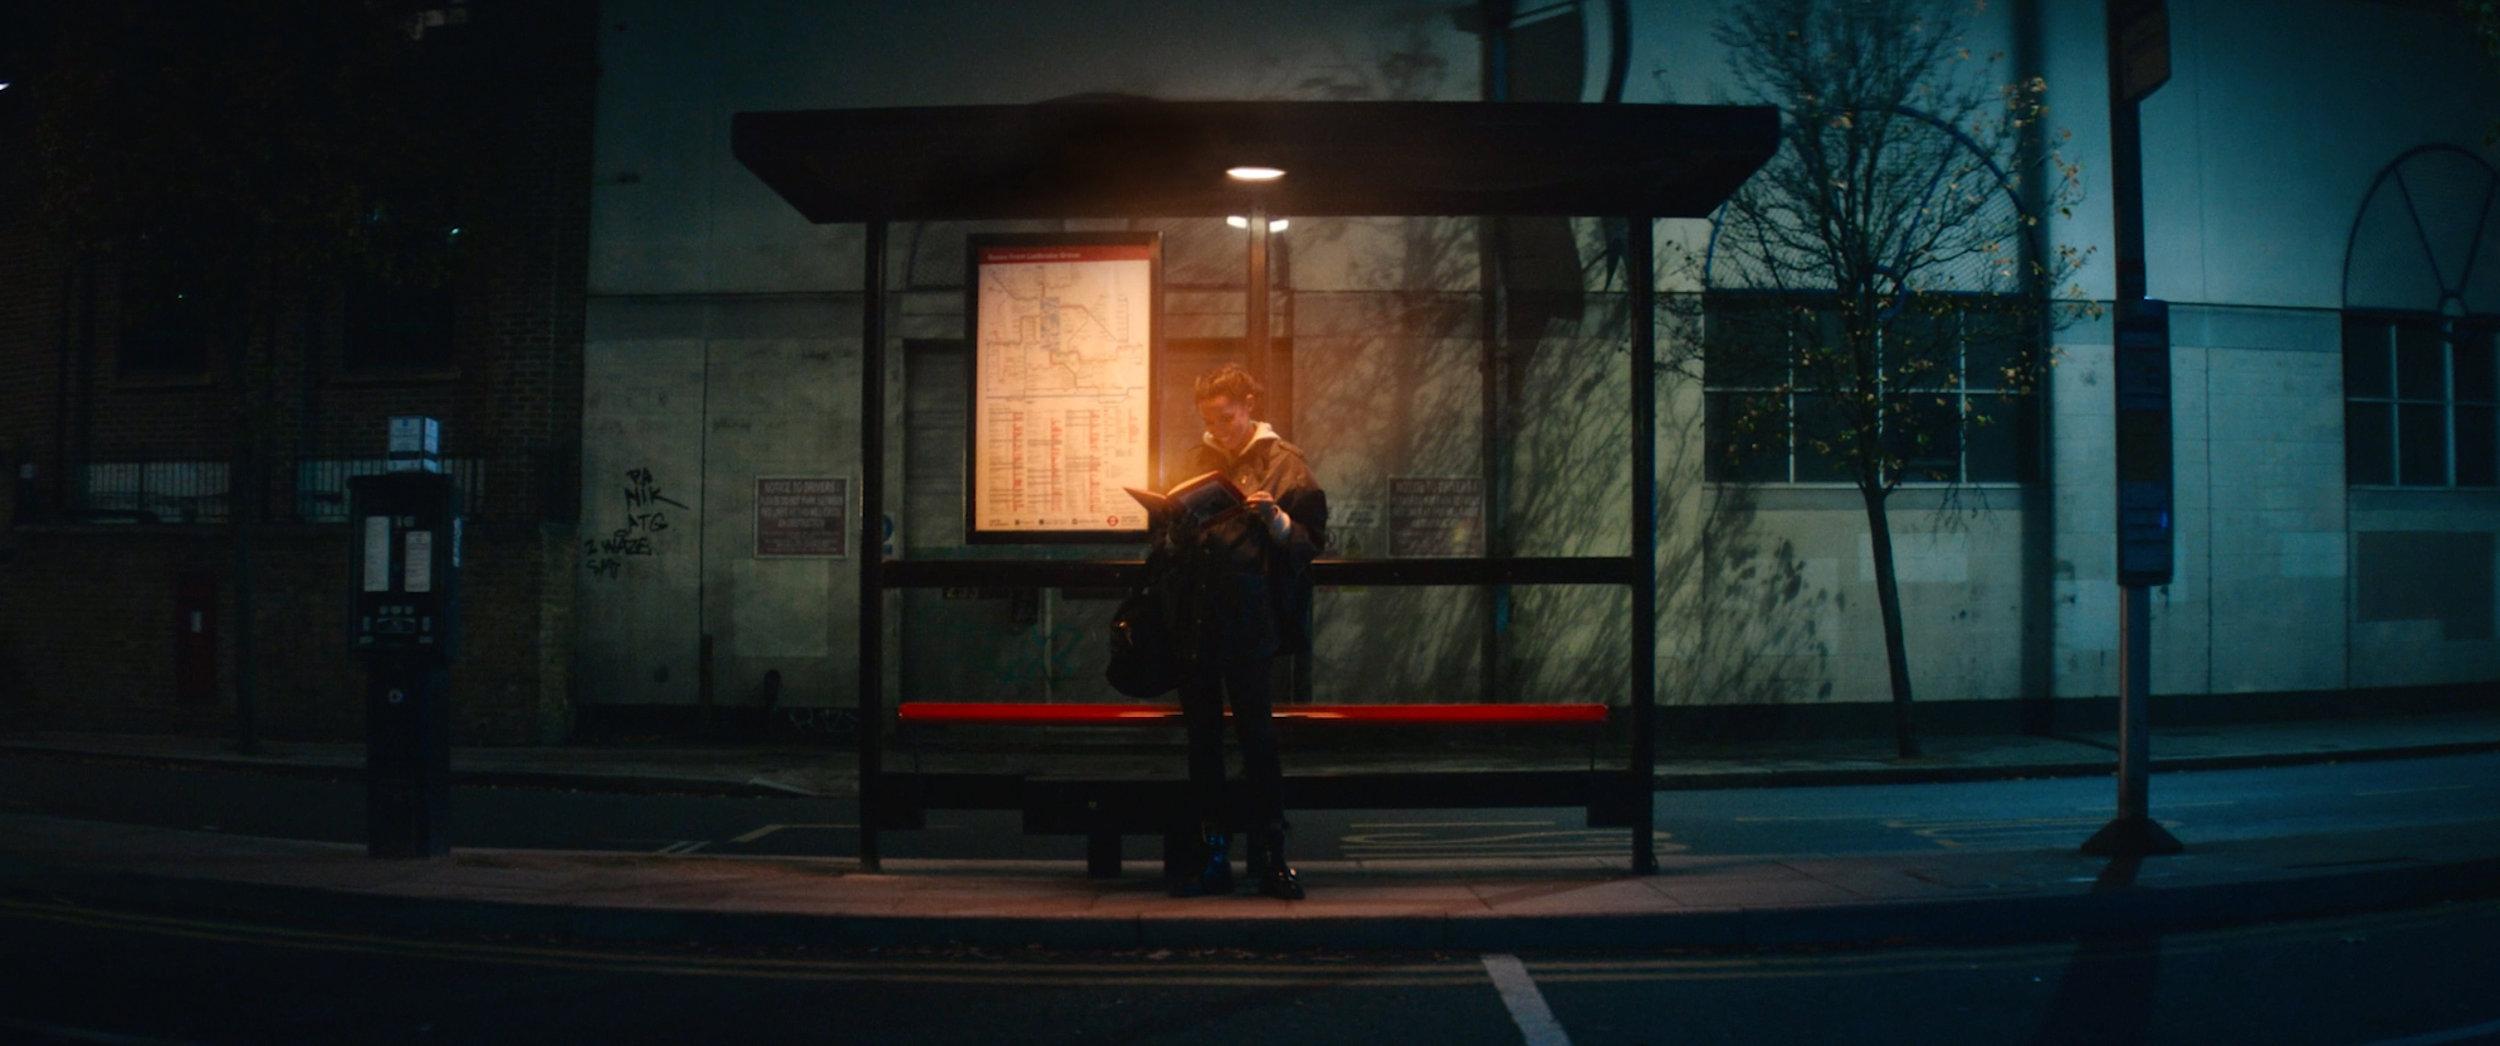 1. Popsa - Glow - William Markarian-Martin.jpg